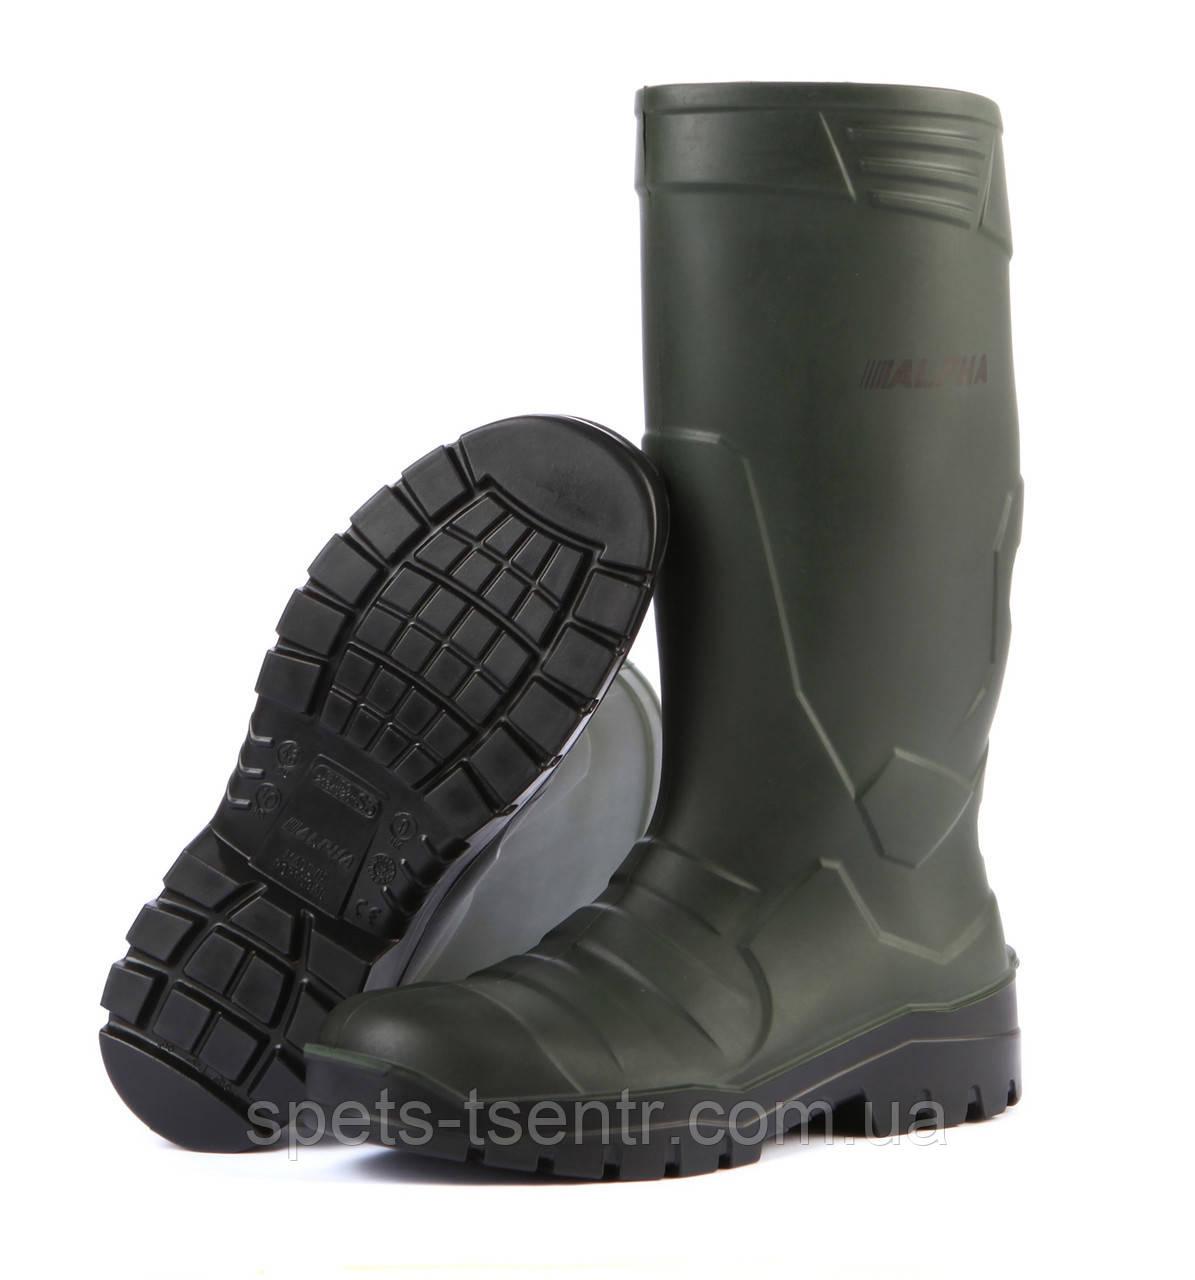 Чоботи захисні Alpha Safety S5 SRC ( шахтарські )